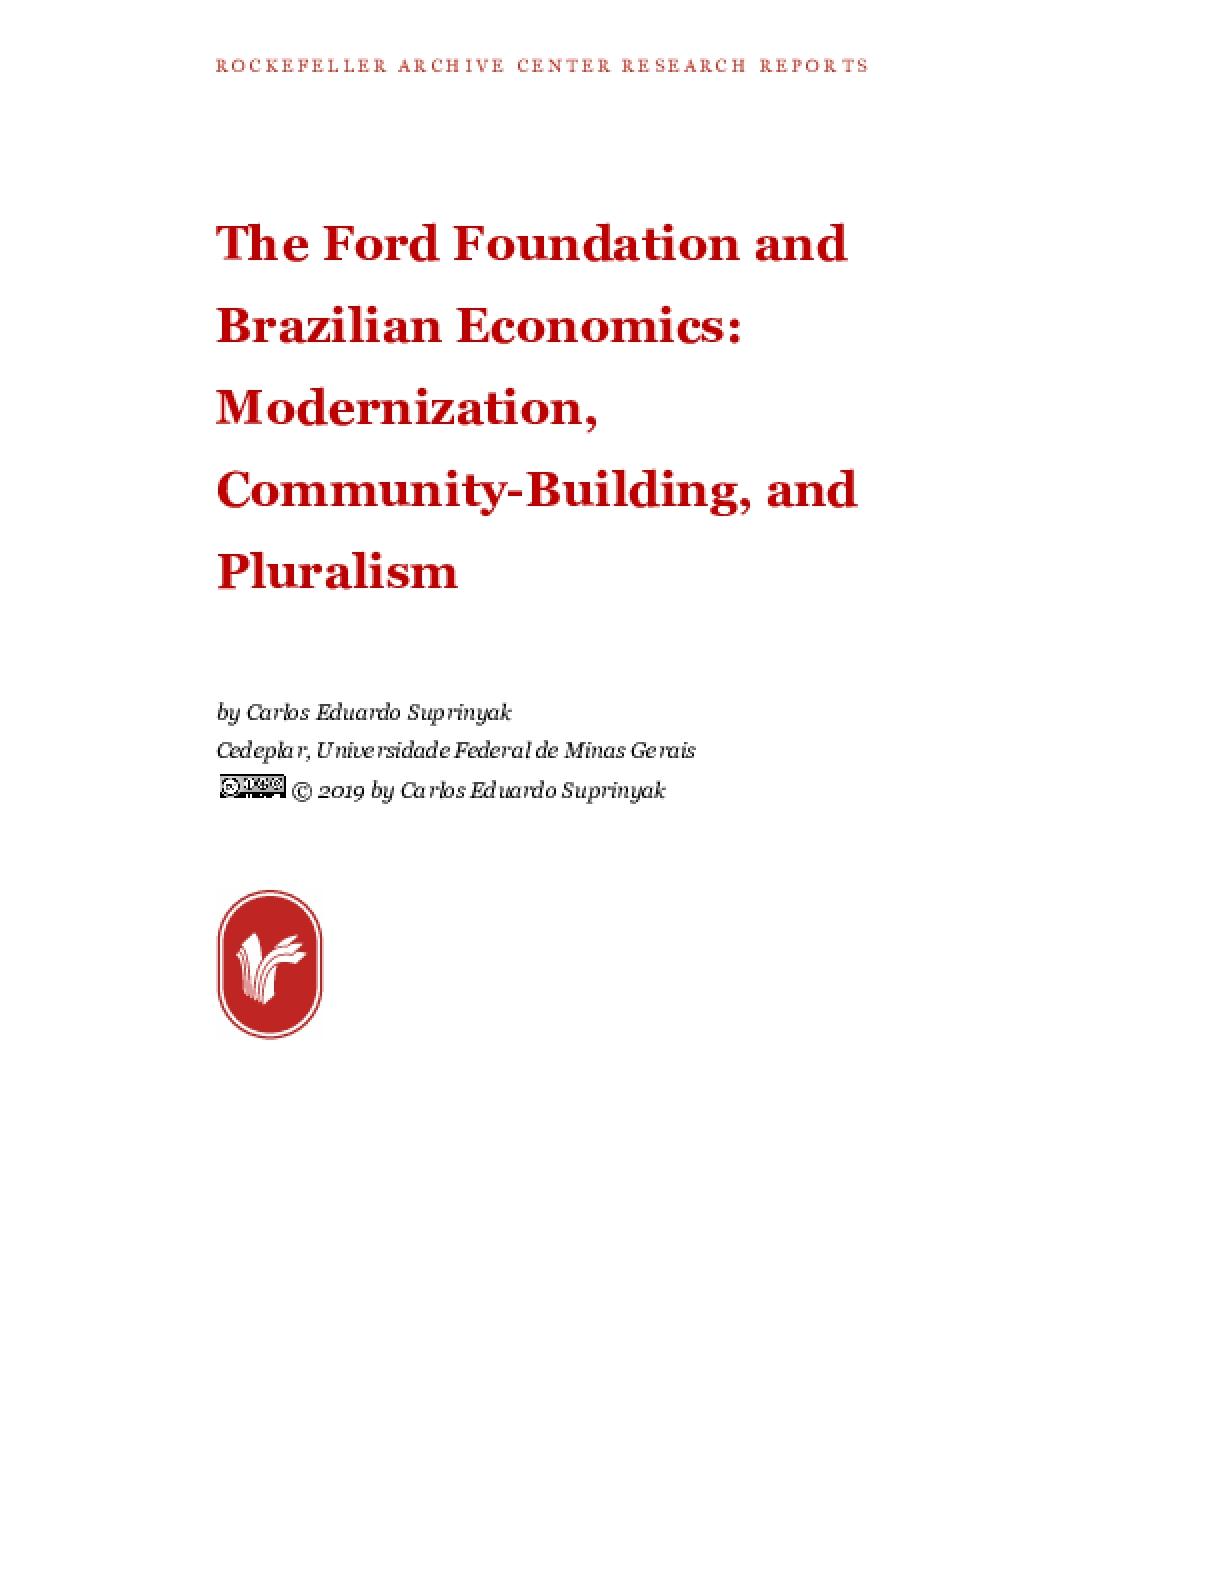 The Ford Foundation and Brazilian Economics: Modernization, Community-Building, and Pluralism